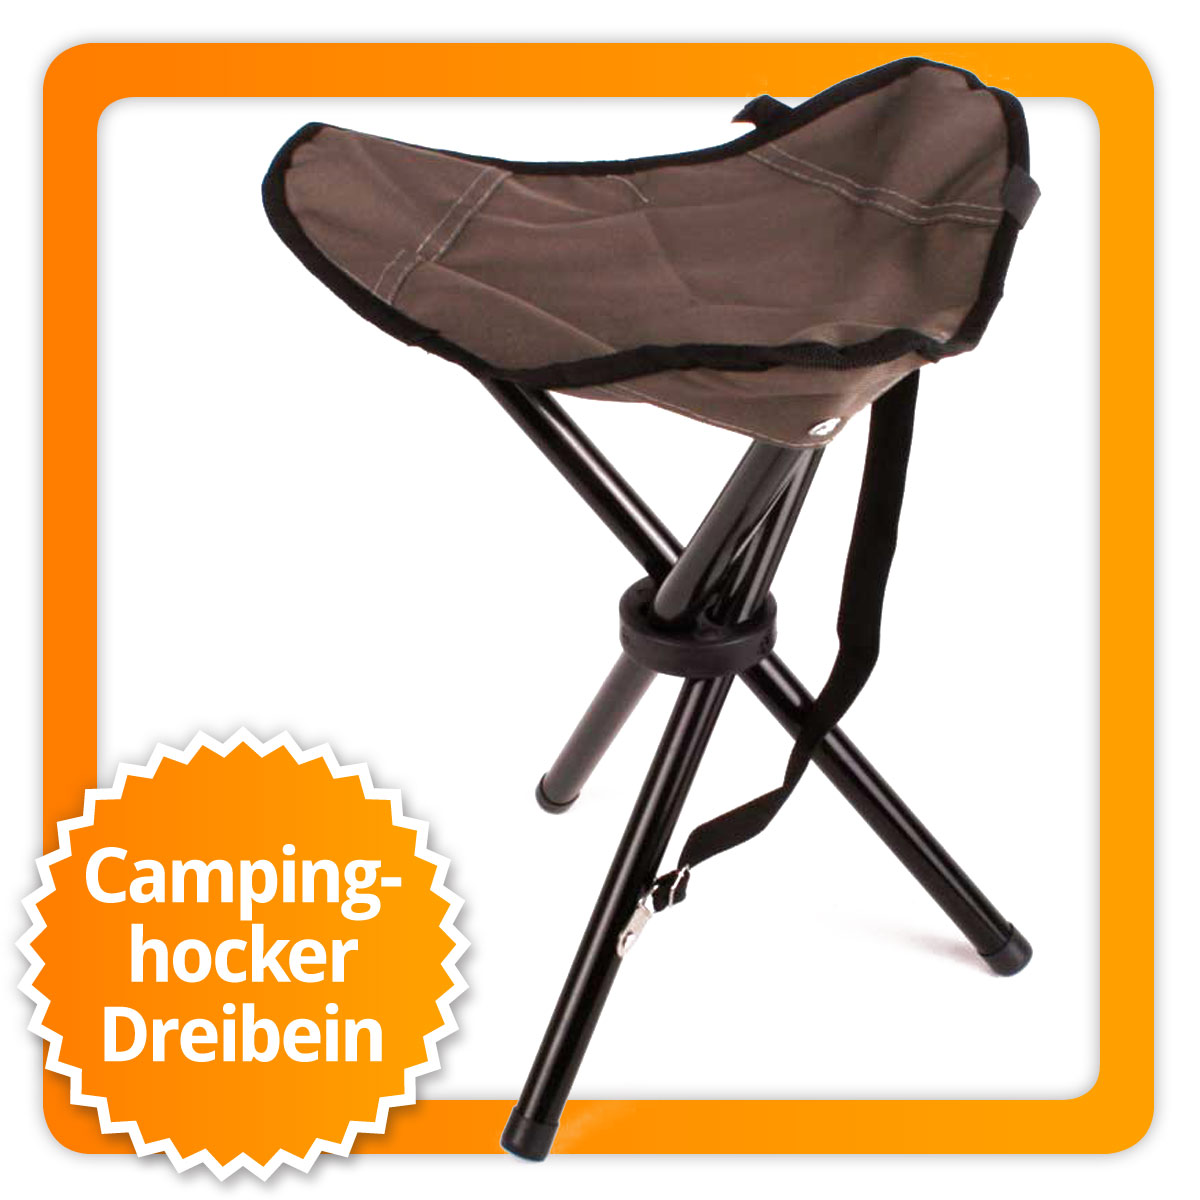 schuh spikes eiskrallen schuhspikes schuhkrallen rutschschutz gr e 36 48 ebay. Black Bedroom Furniture Sets. Home Design Ideas